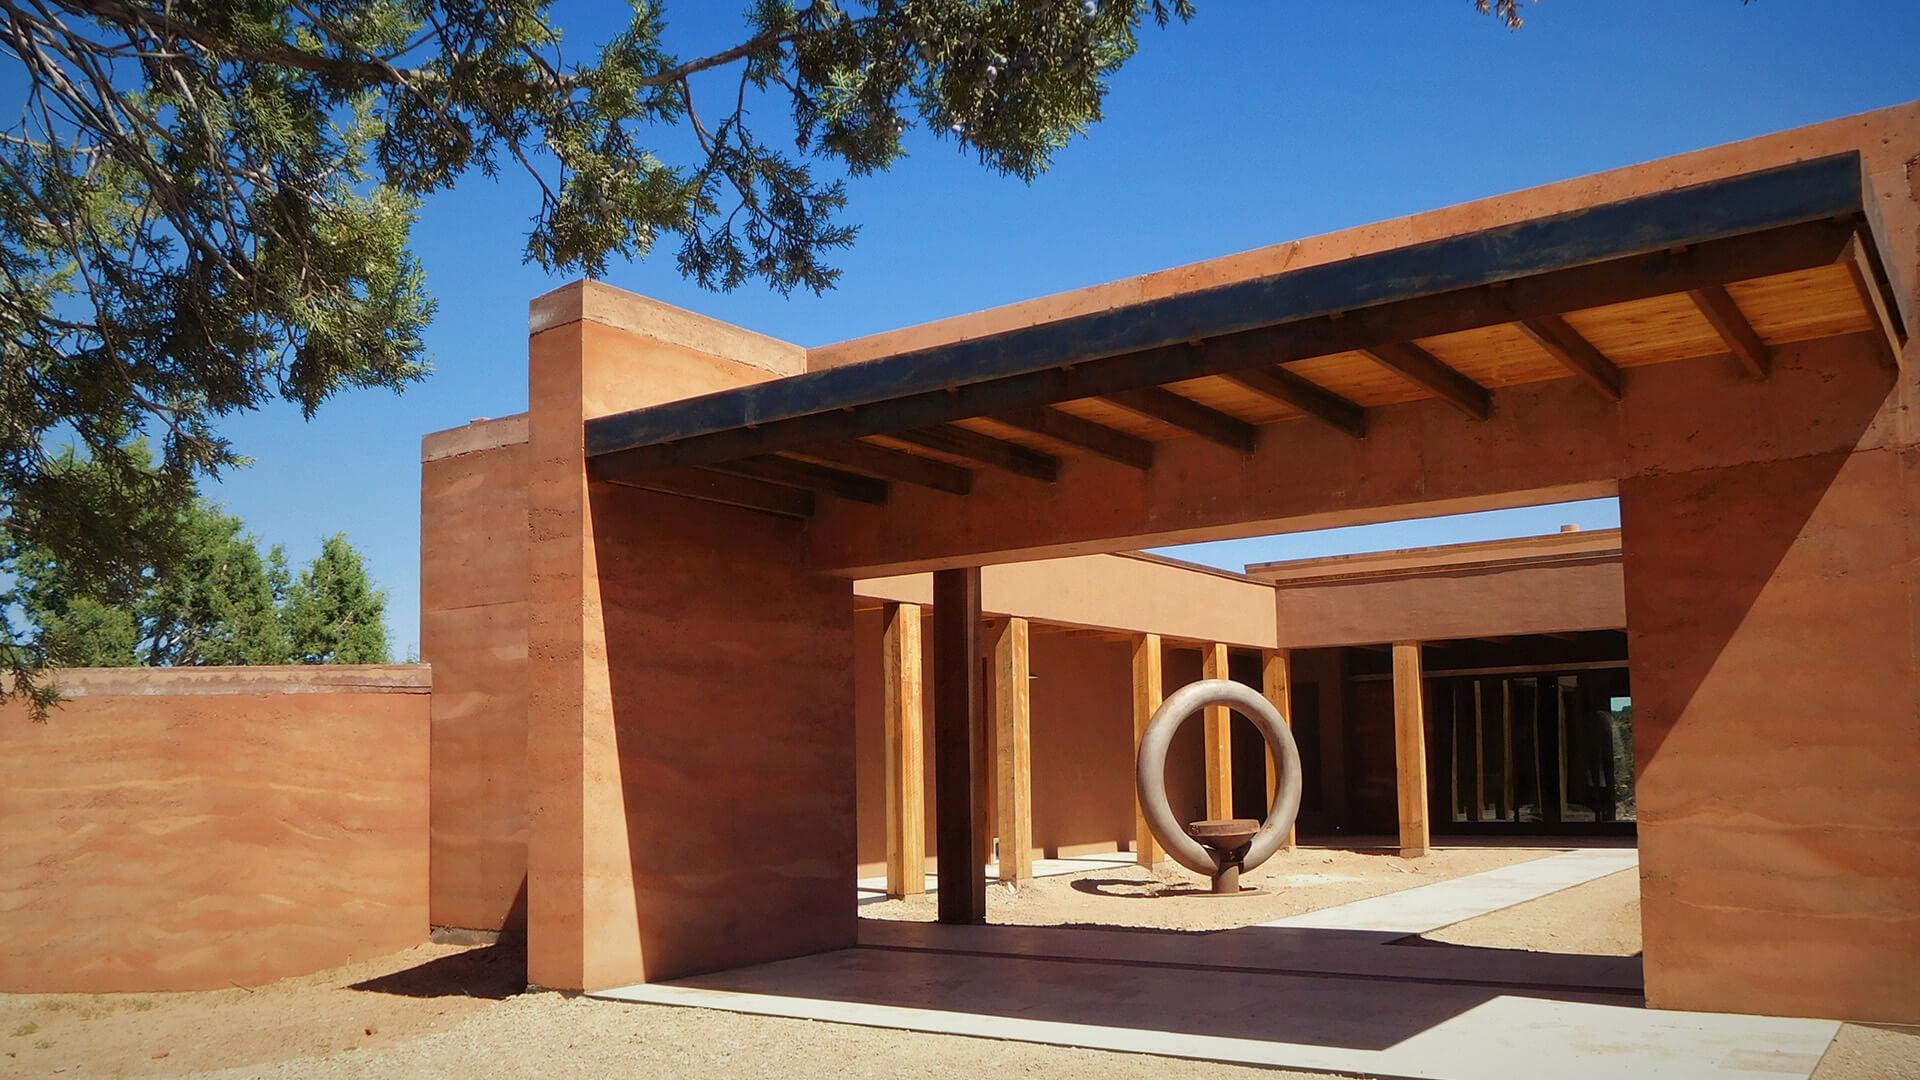 St. George Architects